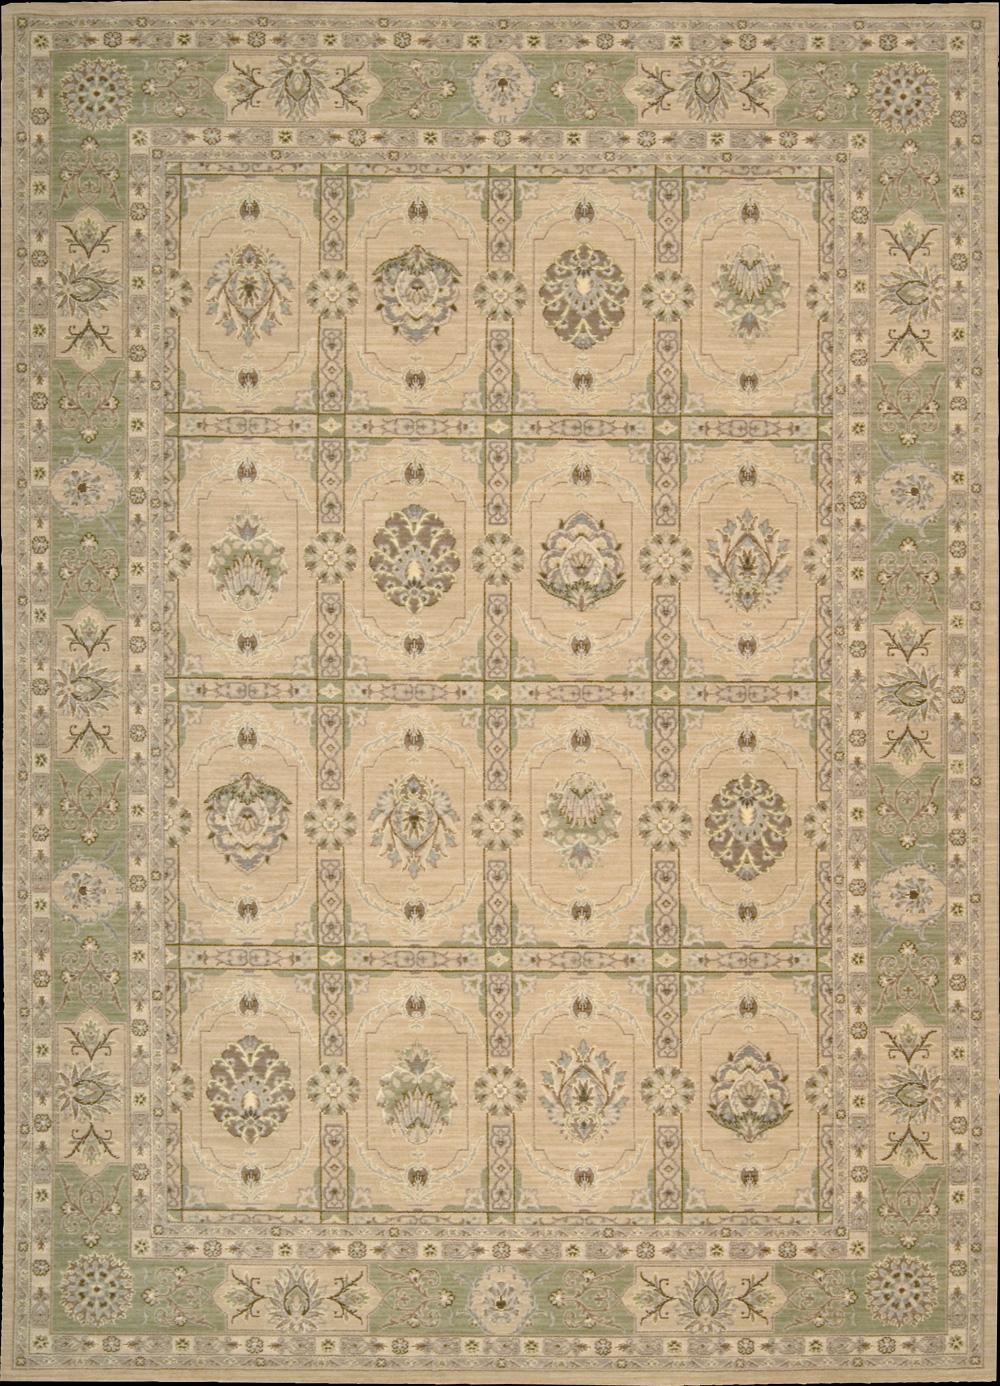 Nourison Persian Empire Area Rug 12' x 15' - Item Number: 25815